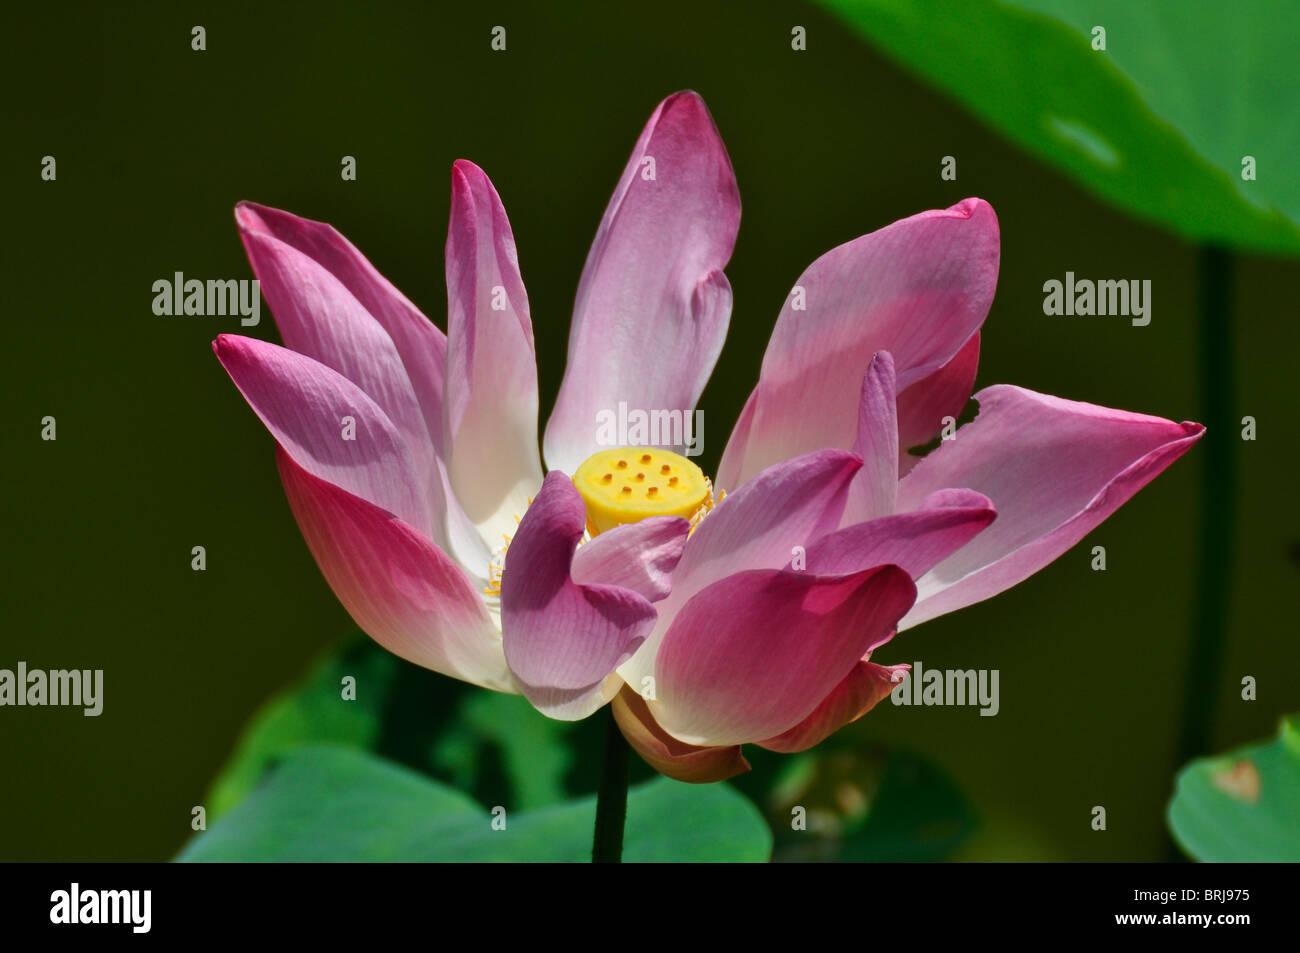 Pink Lotus Flower at a Resort in Nha Trang in Vietnam - Stock Image